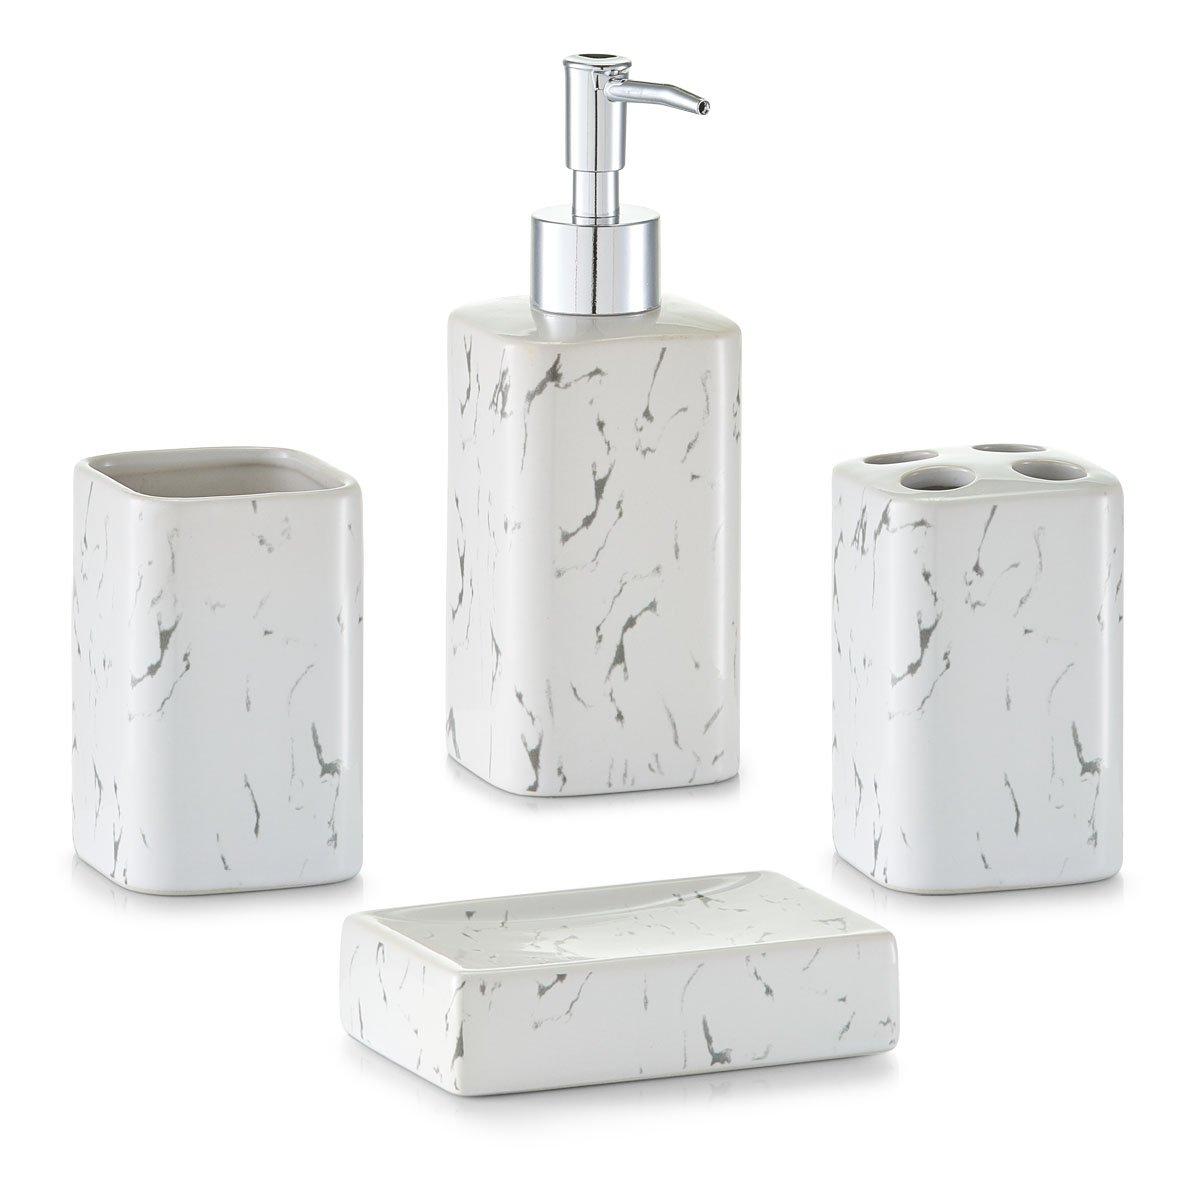 Zeller 18256Marmo accessori da bagno, ceramica, bianco, 22x 21x 7cm Zeller Present Handels